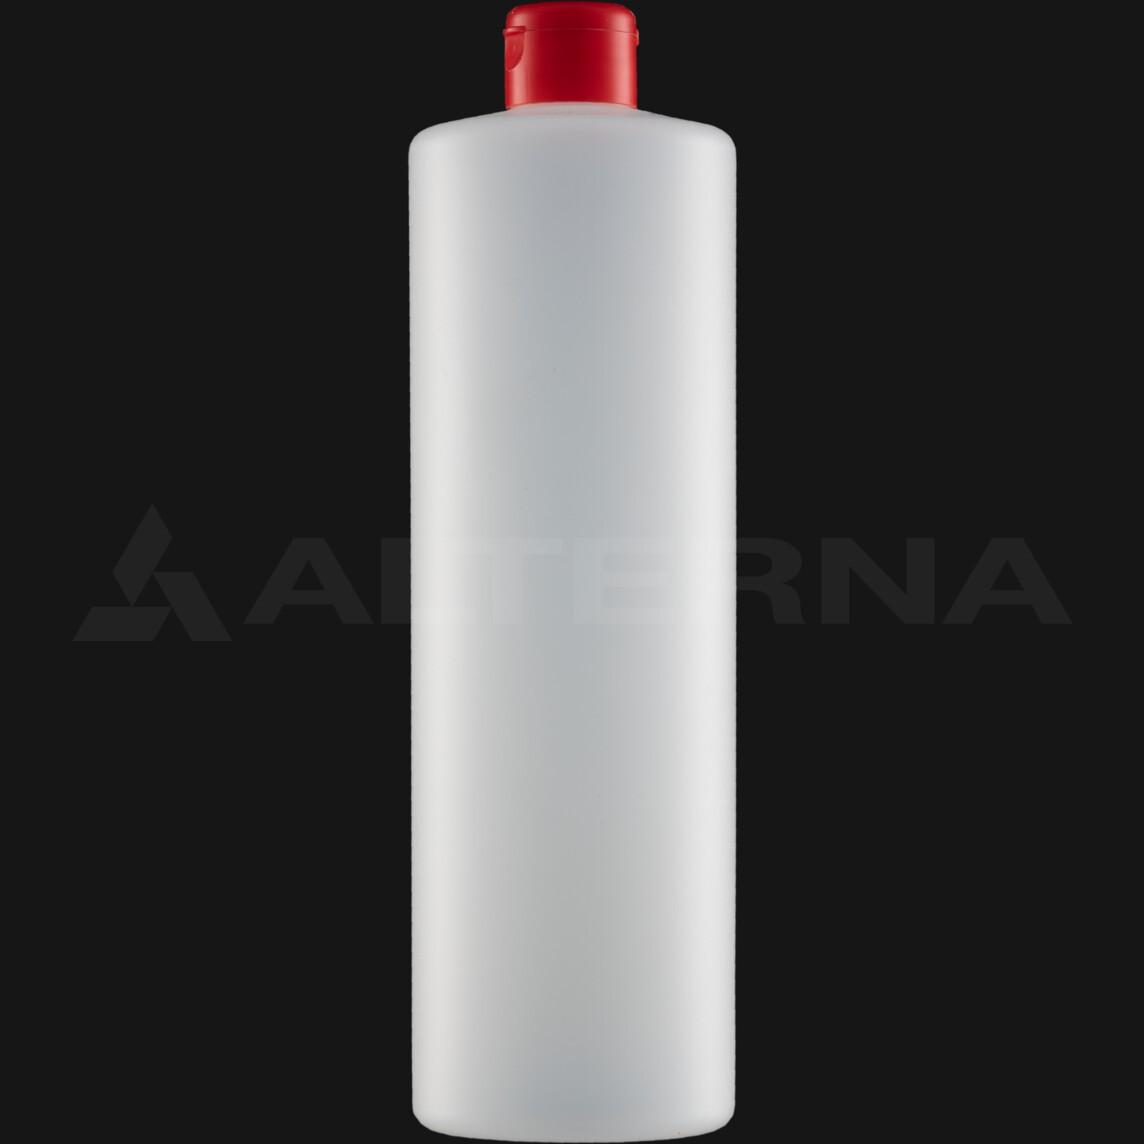 1000 ml HDPE Bottle with 28 mm Flip Top Cap